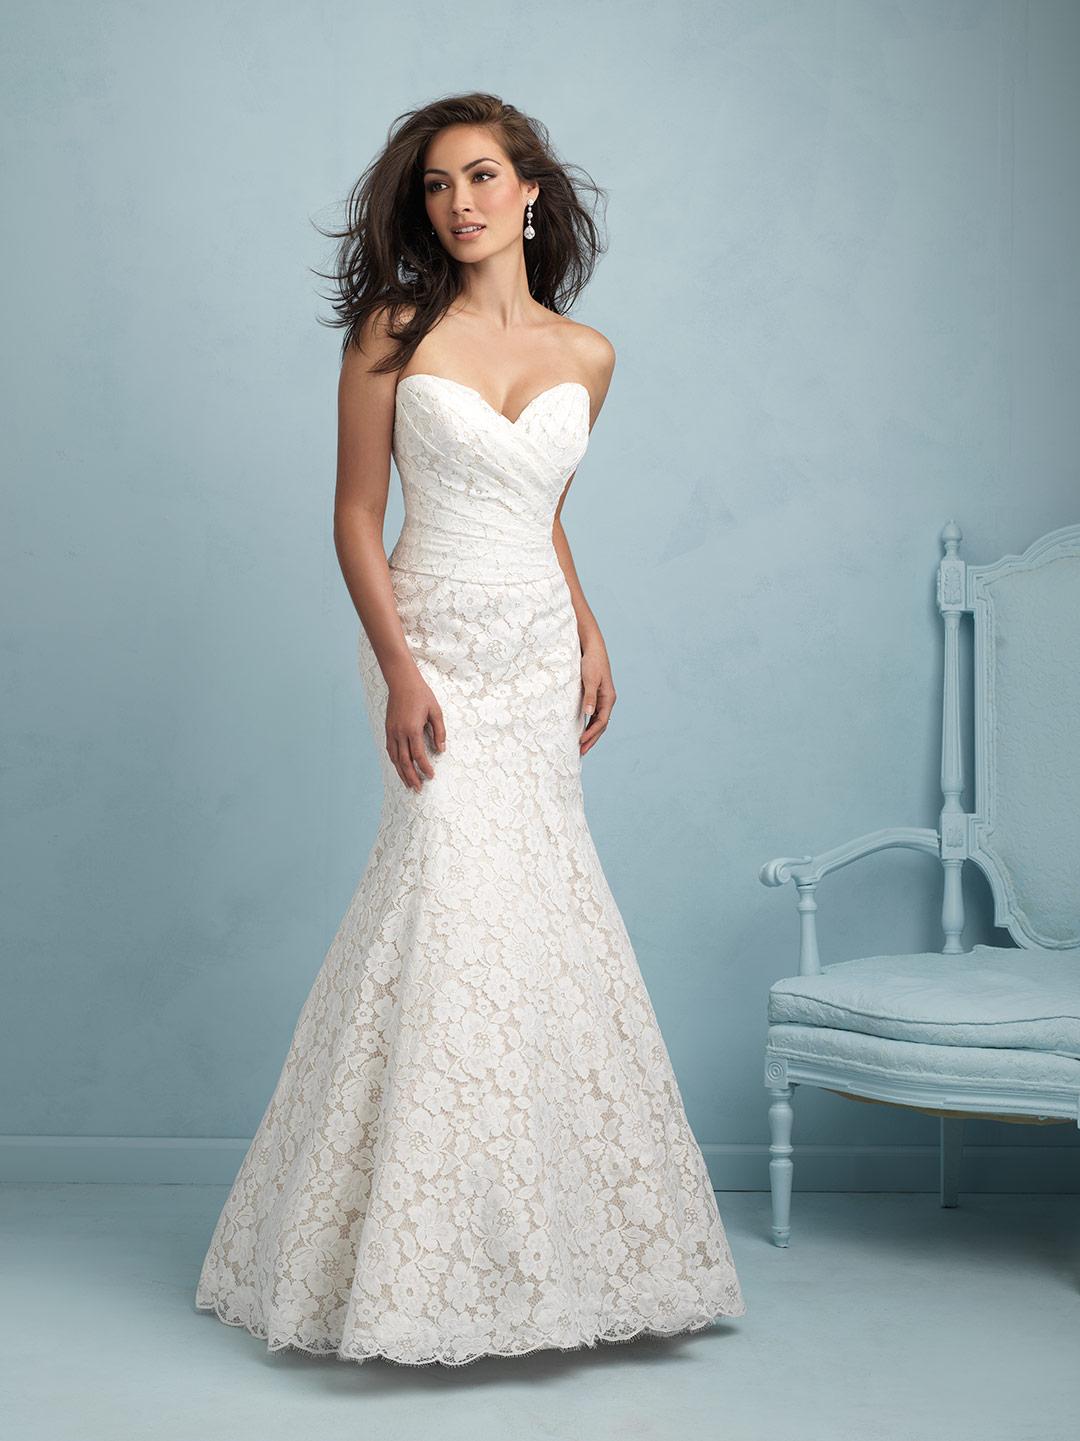 Charmant Wedding Dress Outlet Dallas Ideen - Brautkleider Ideen ...